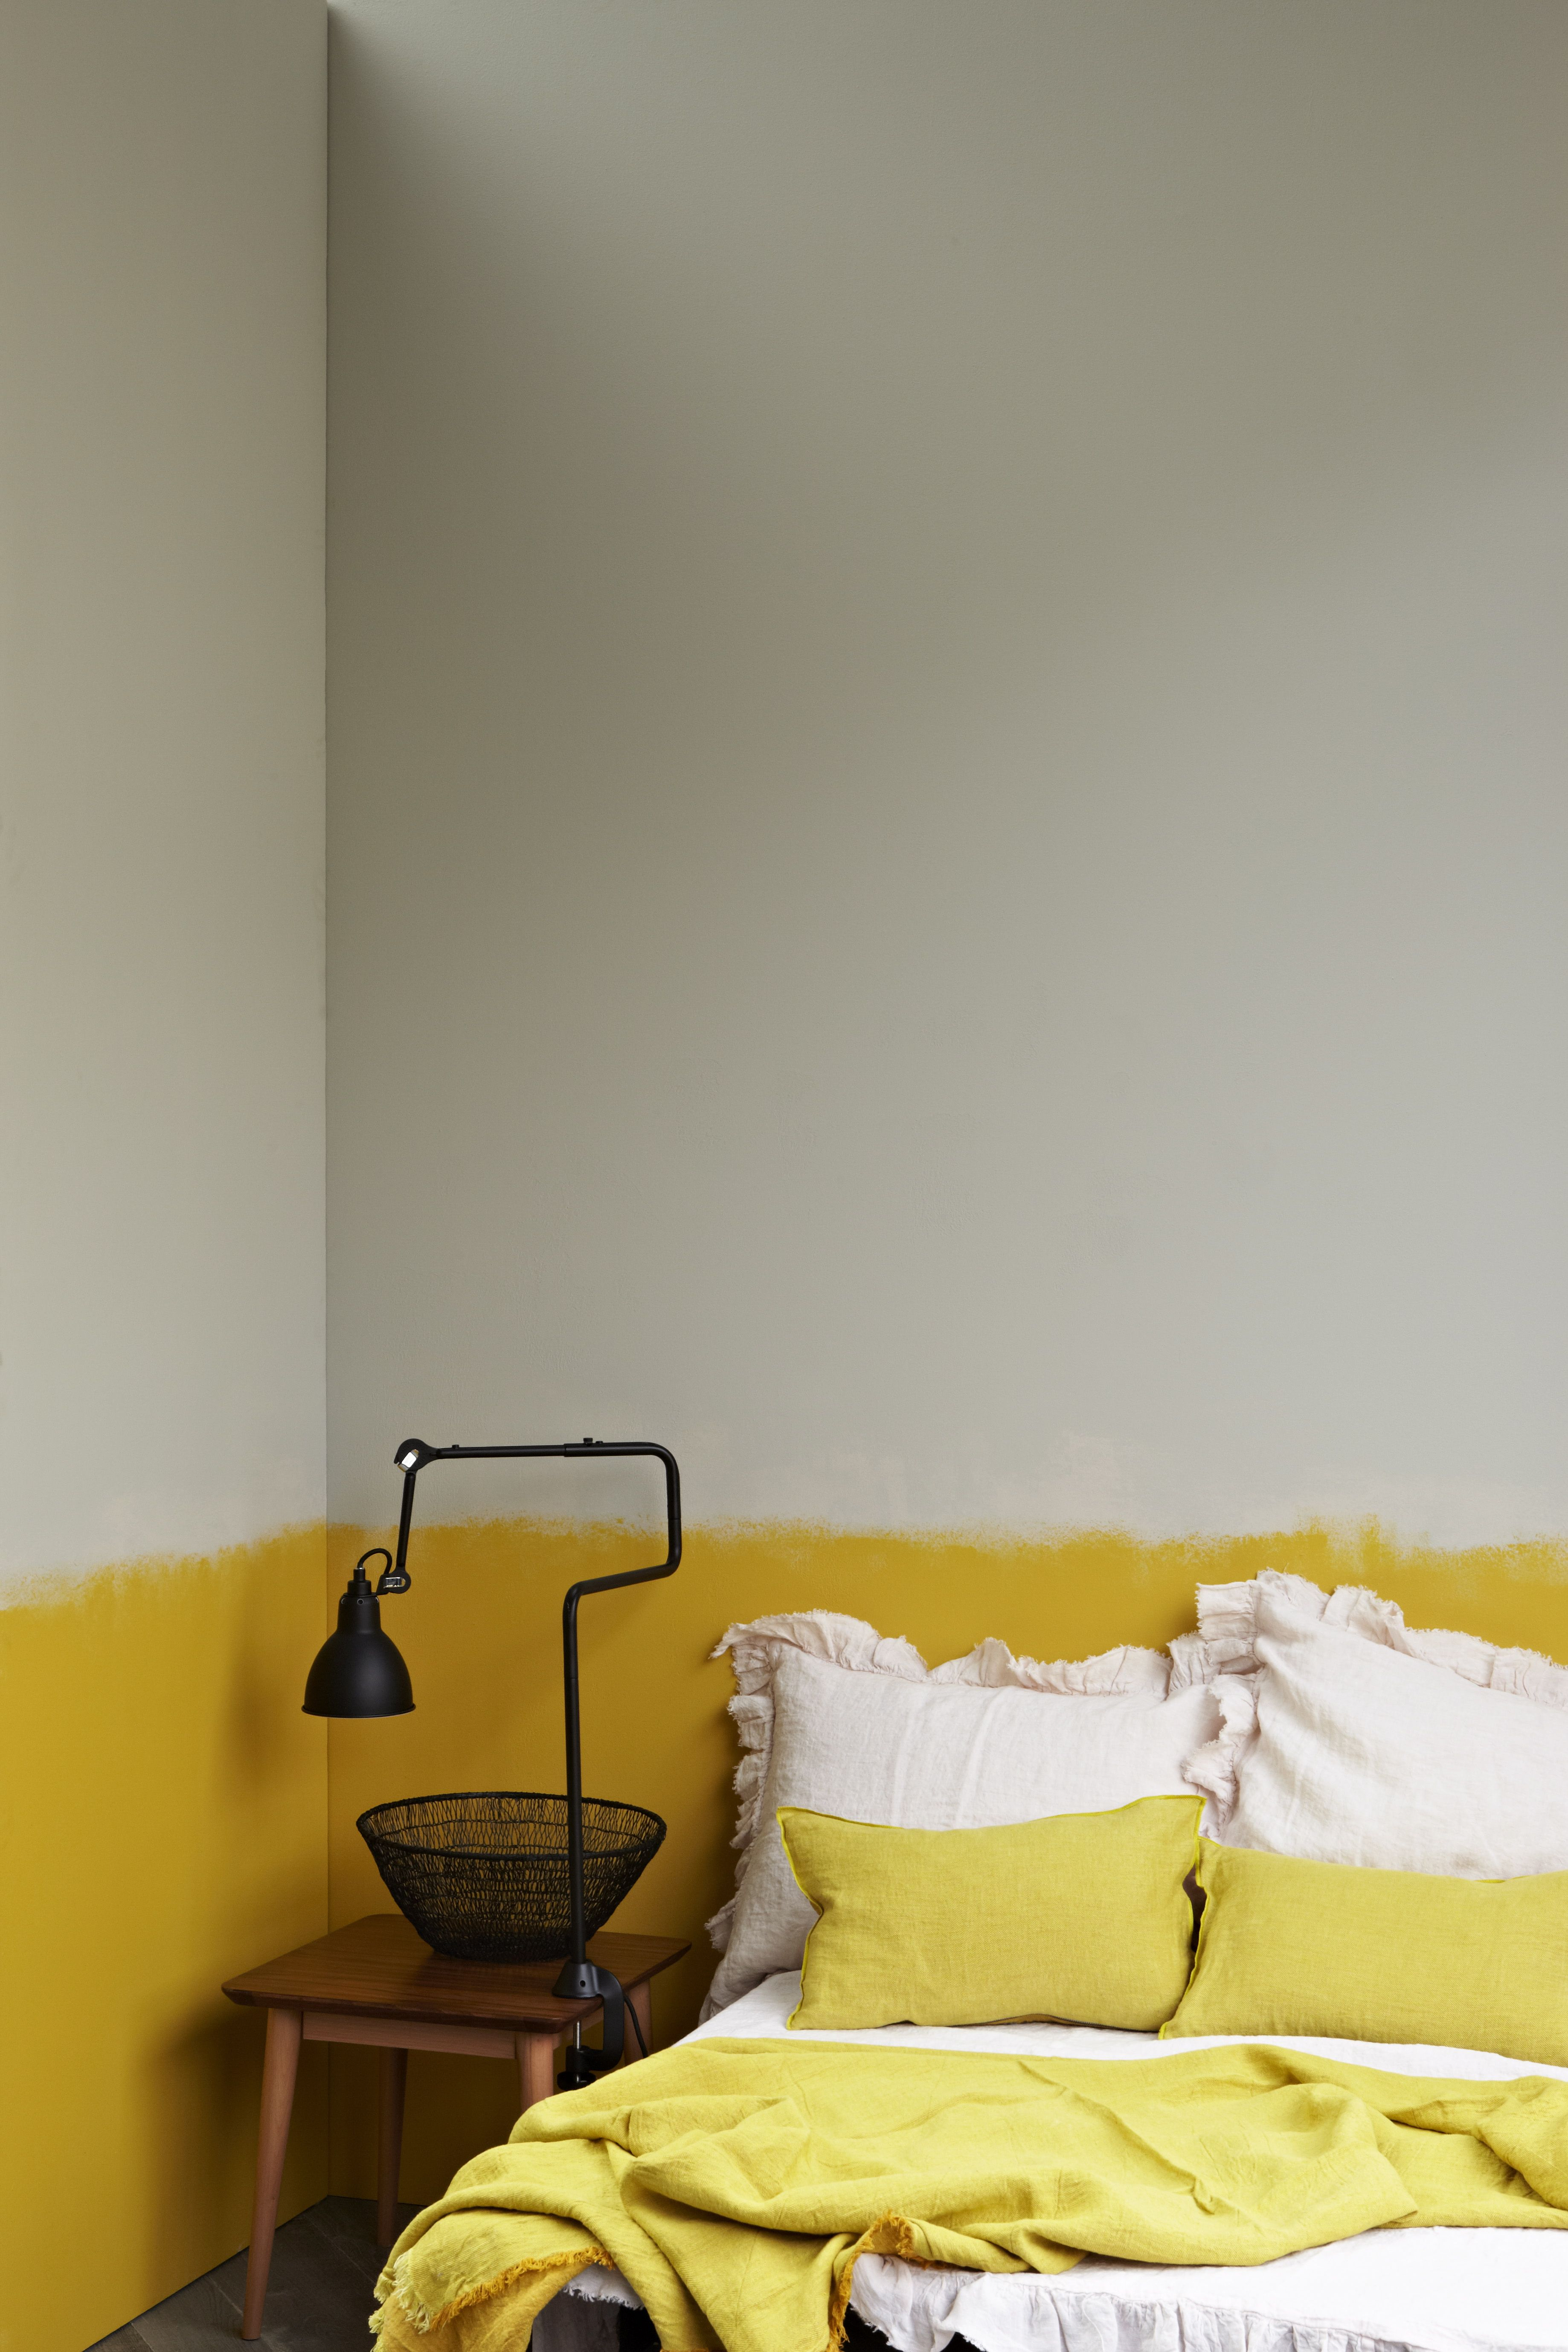 Chambre Jaune Moutarde | Chambre Bebe Jaune Moutarde